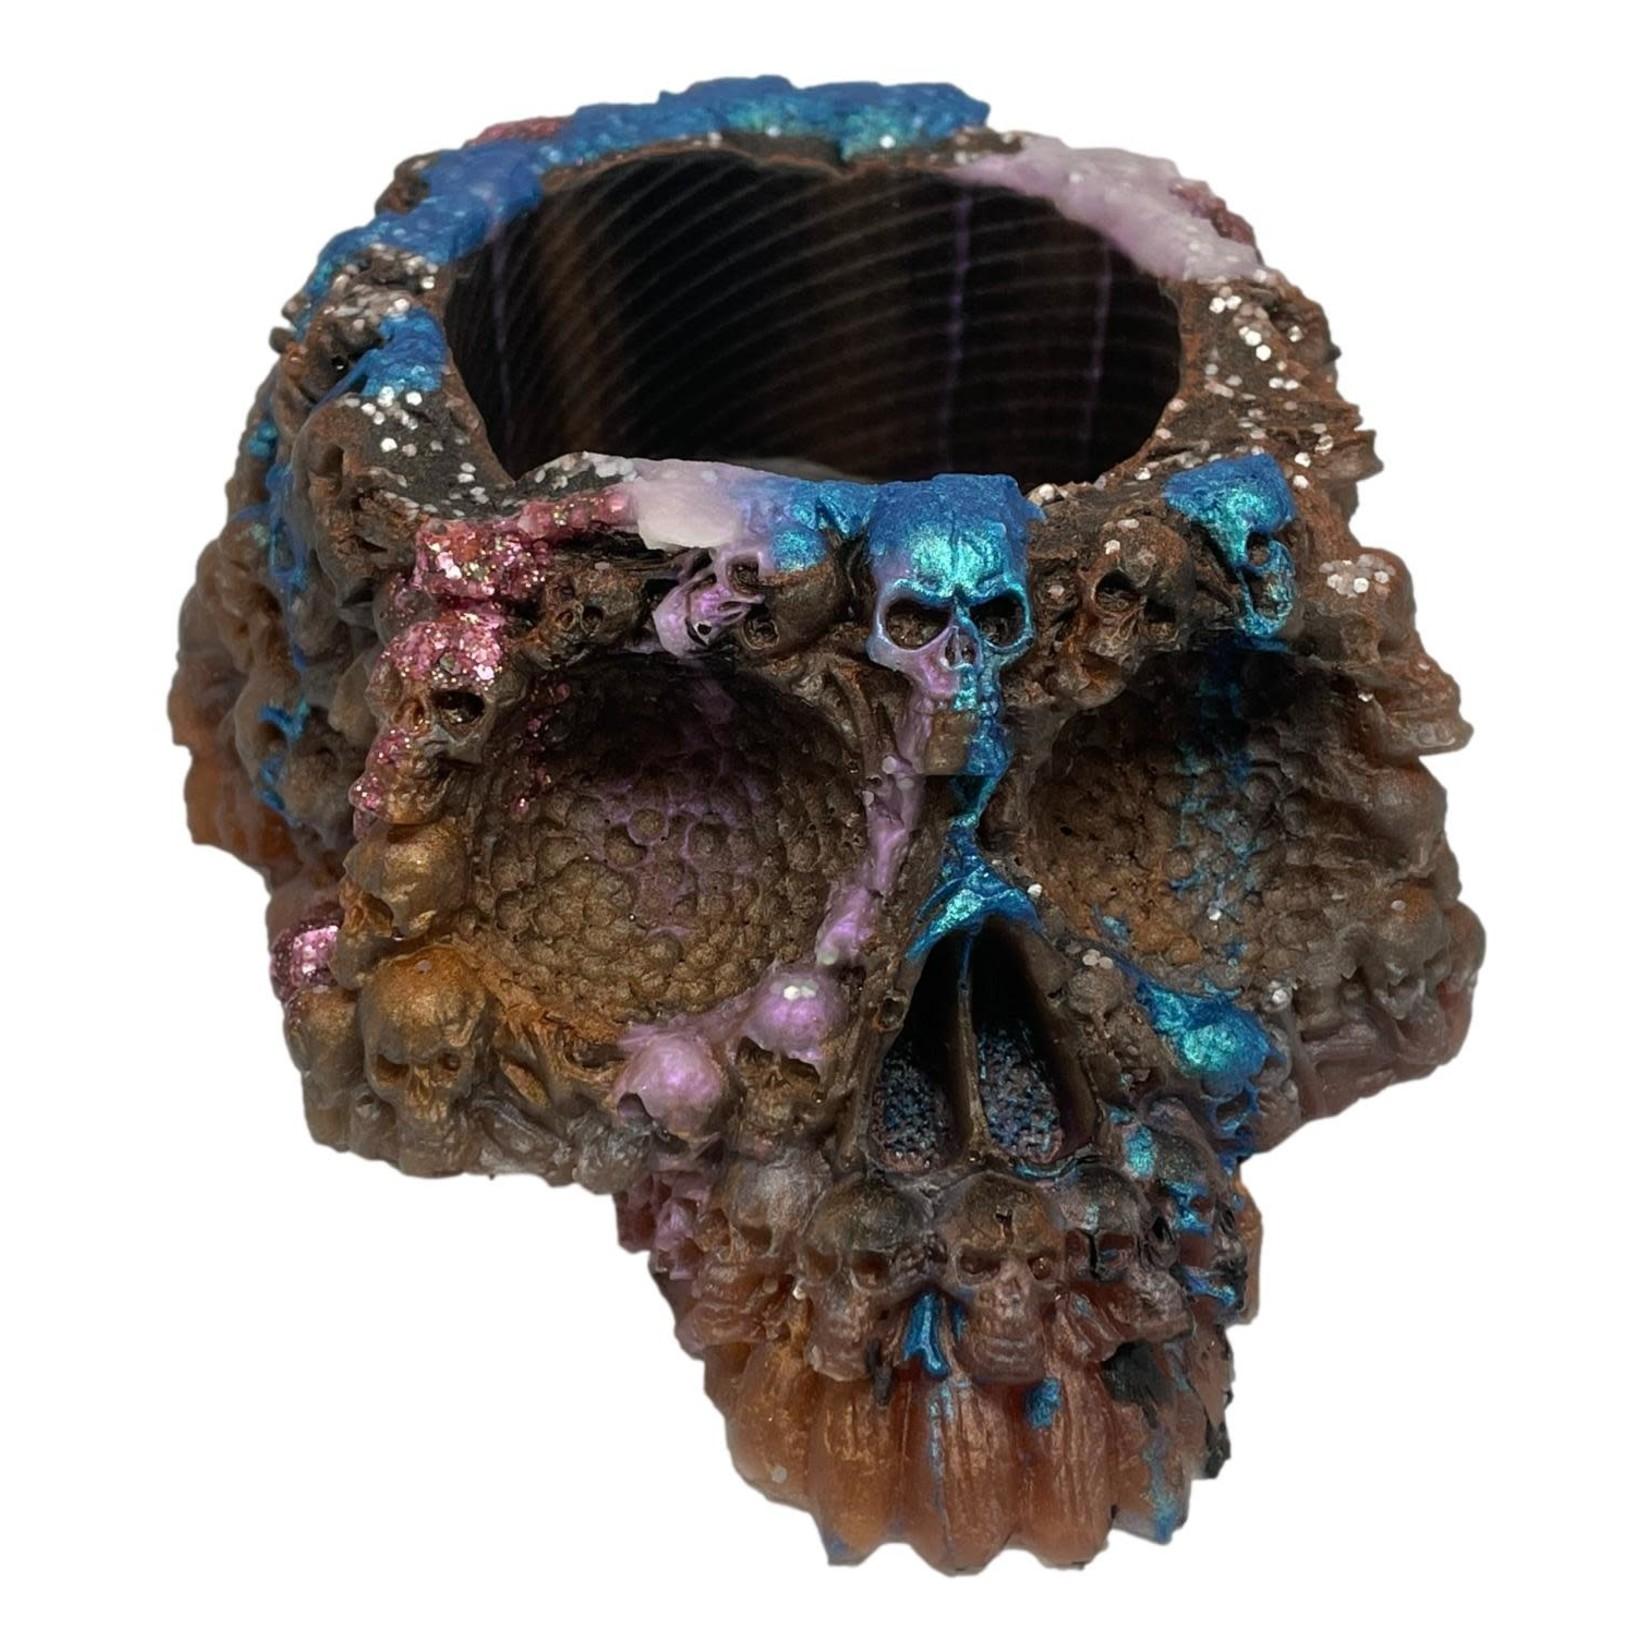 East Coast Sirens Coloured Skull Planter